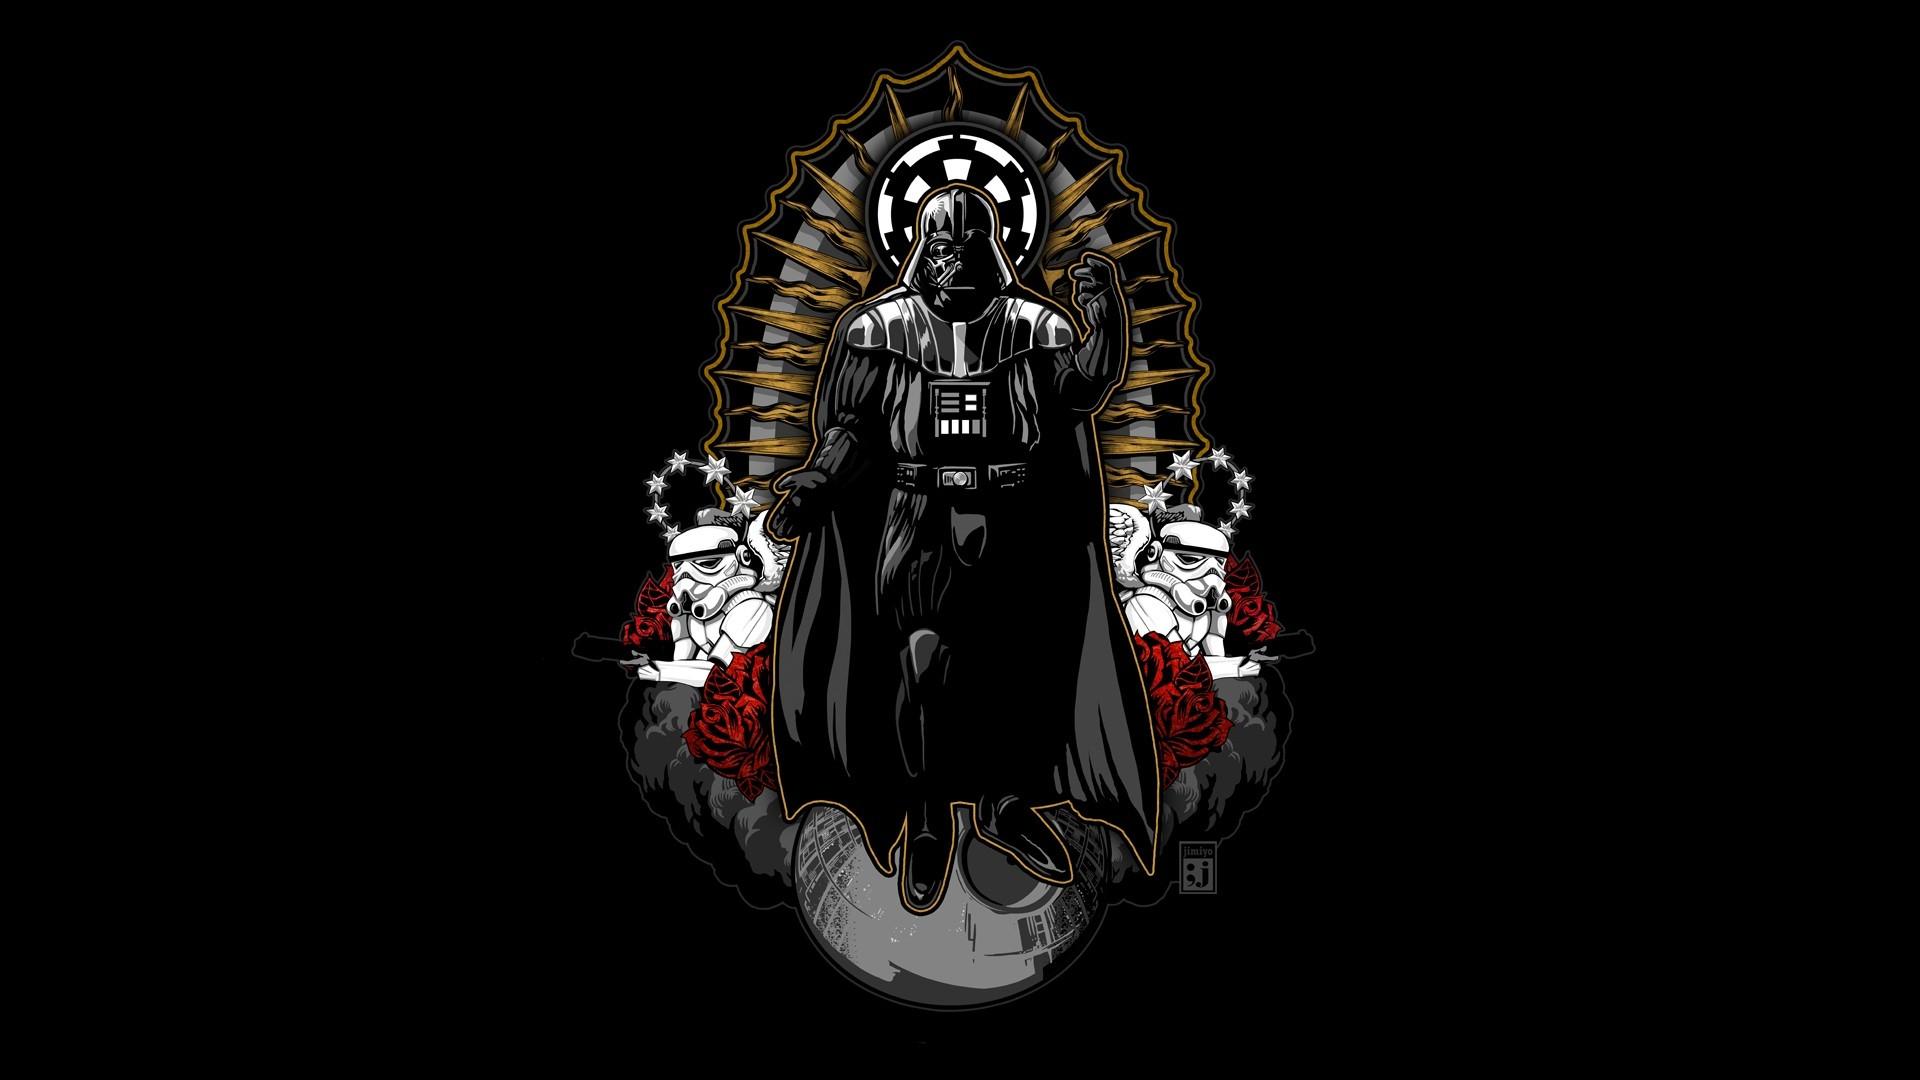 Free Download Darth Vader Wallpaper 1920x1080 Download Star Wars Wallpaper 1920x1080 1920x1080 For Your Desktop Mobile Tablet Explore 40 Darth Maul Wallpaper 1080p Darth Maul Hd Wallpaper Darth Maul